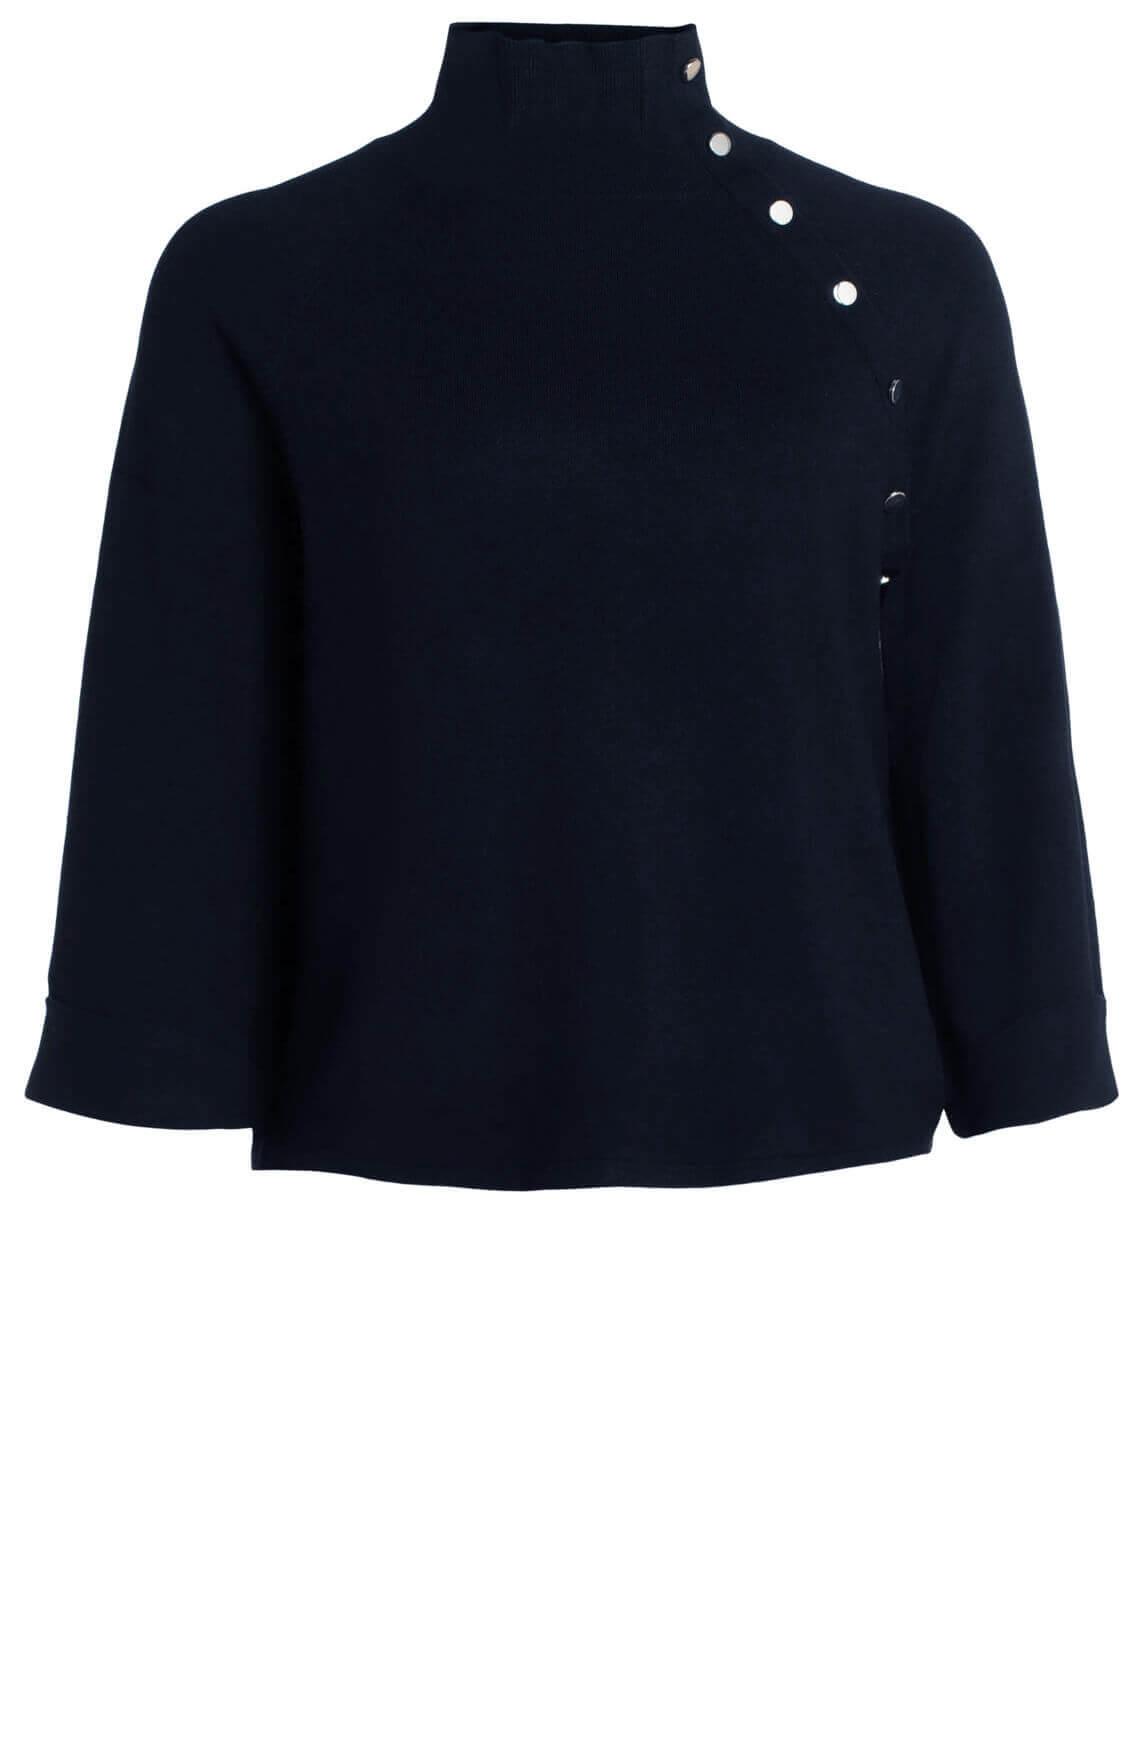 Anna Dames Pullover met sierknoopjes Blauw